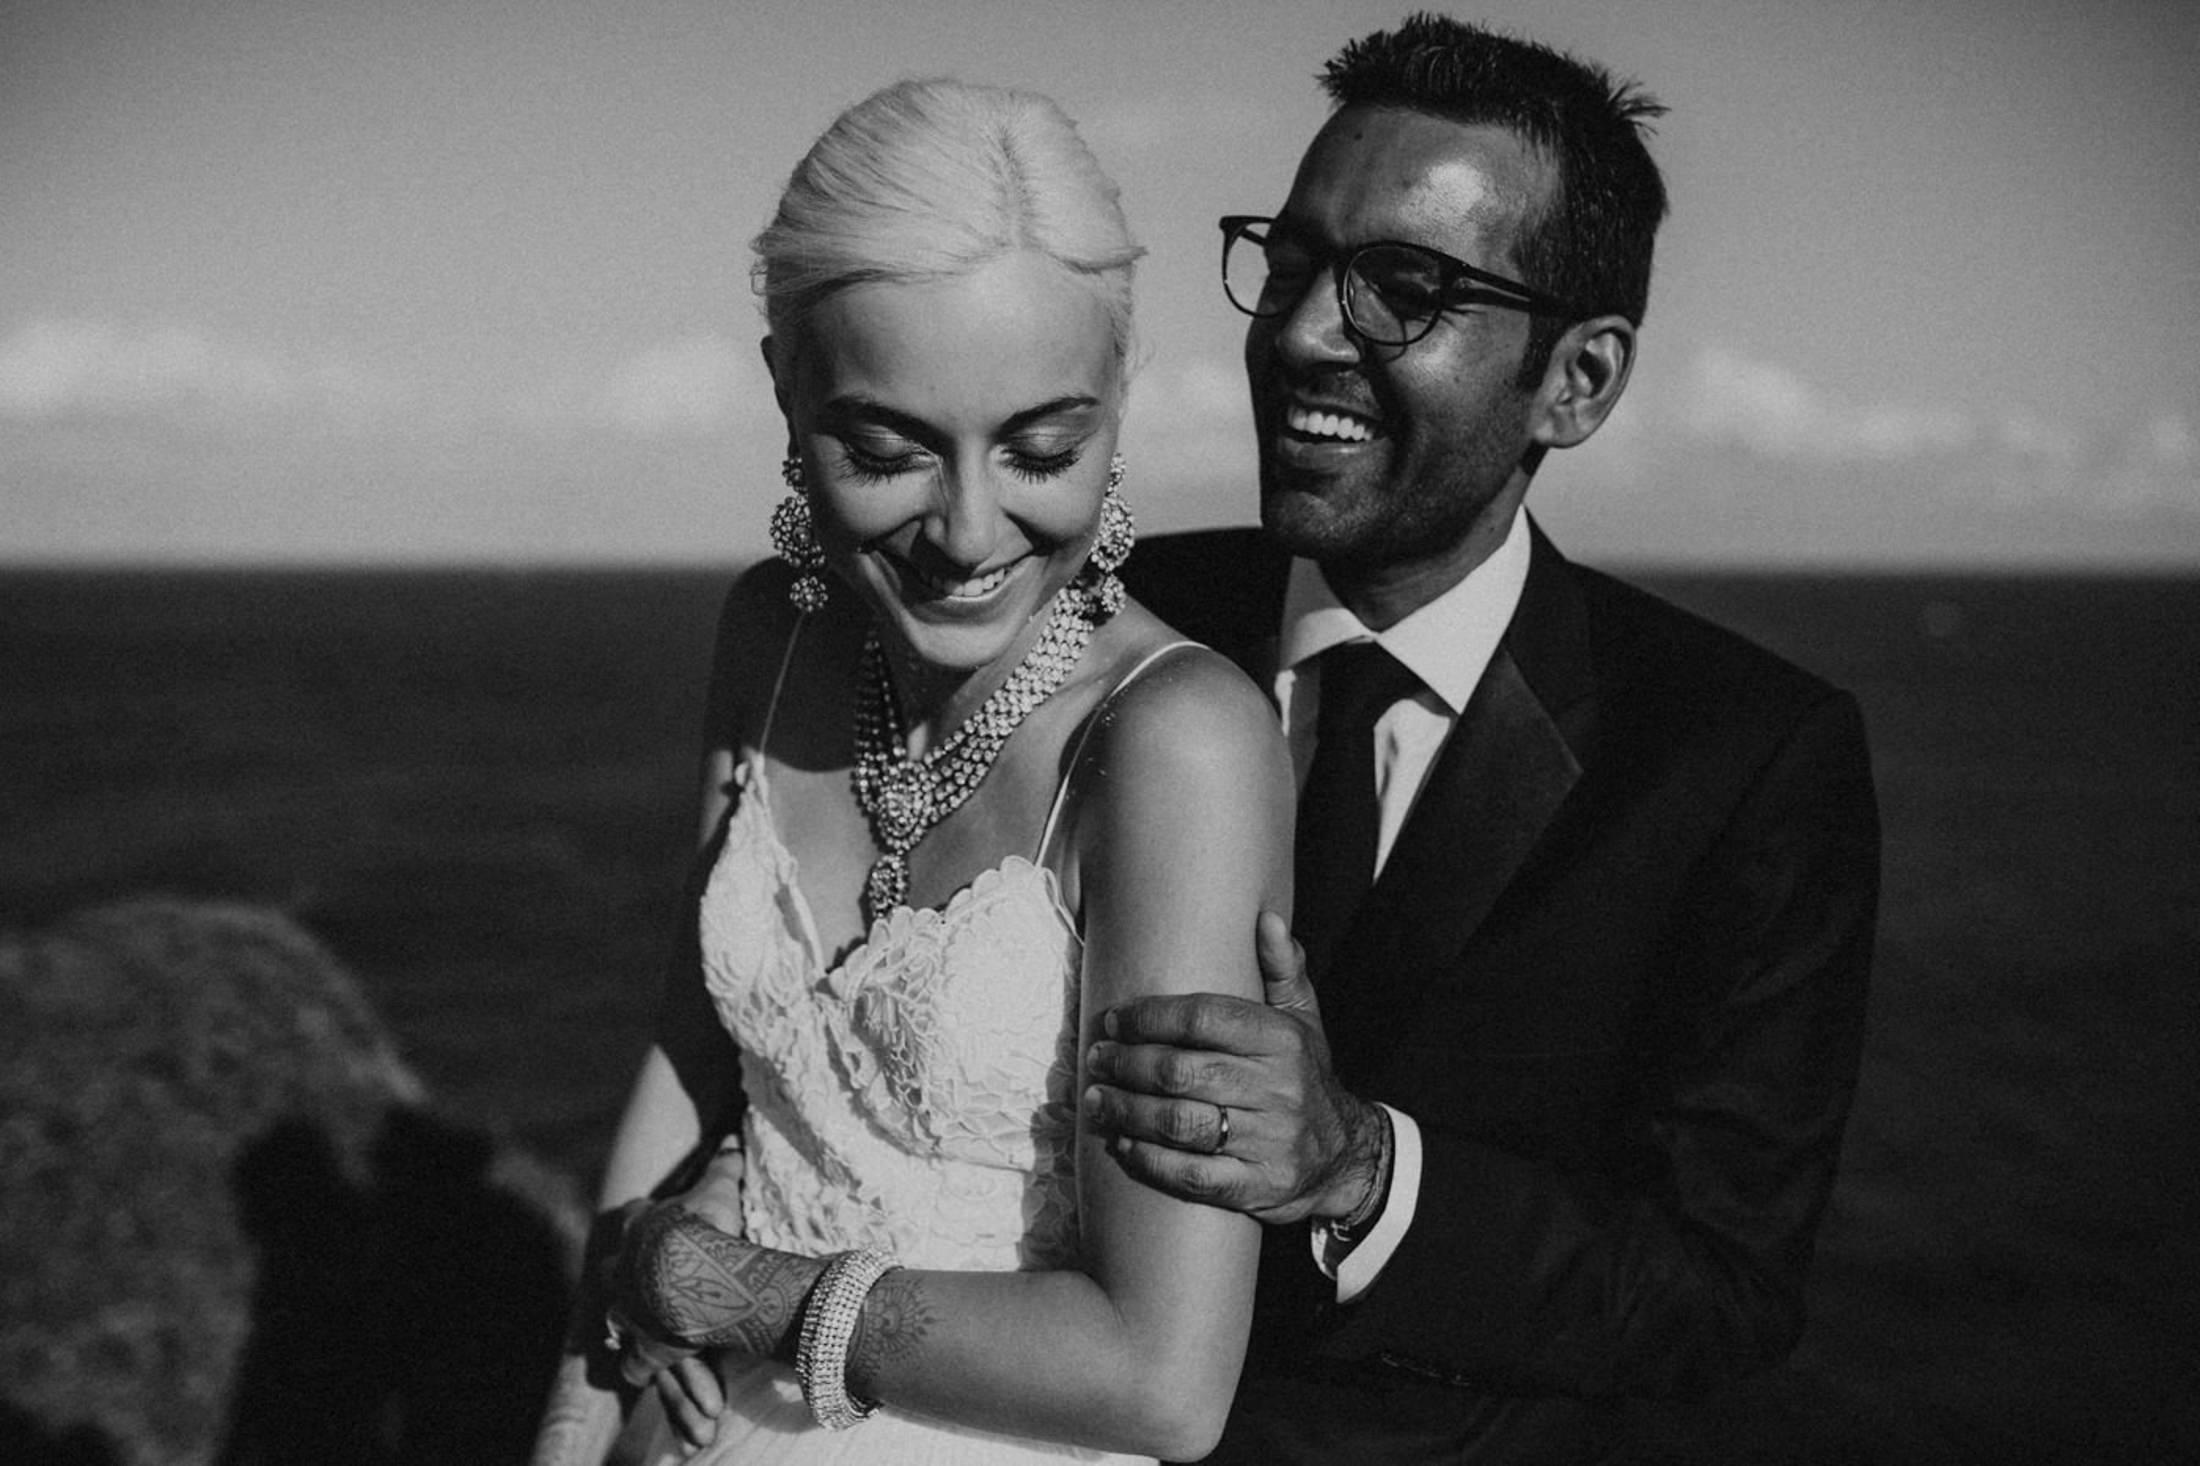 Wedding_Photographer_Mallorca_Daniela-Marquardt_Photography_New_York_Iceland_Tuscany_Santorini_Portugal_Austria_Bavaria_Elopement_Hochzeitsfotograf_AntjeRajat2_81